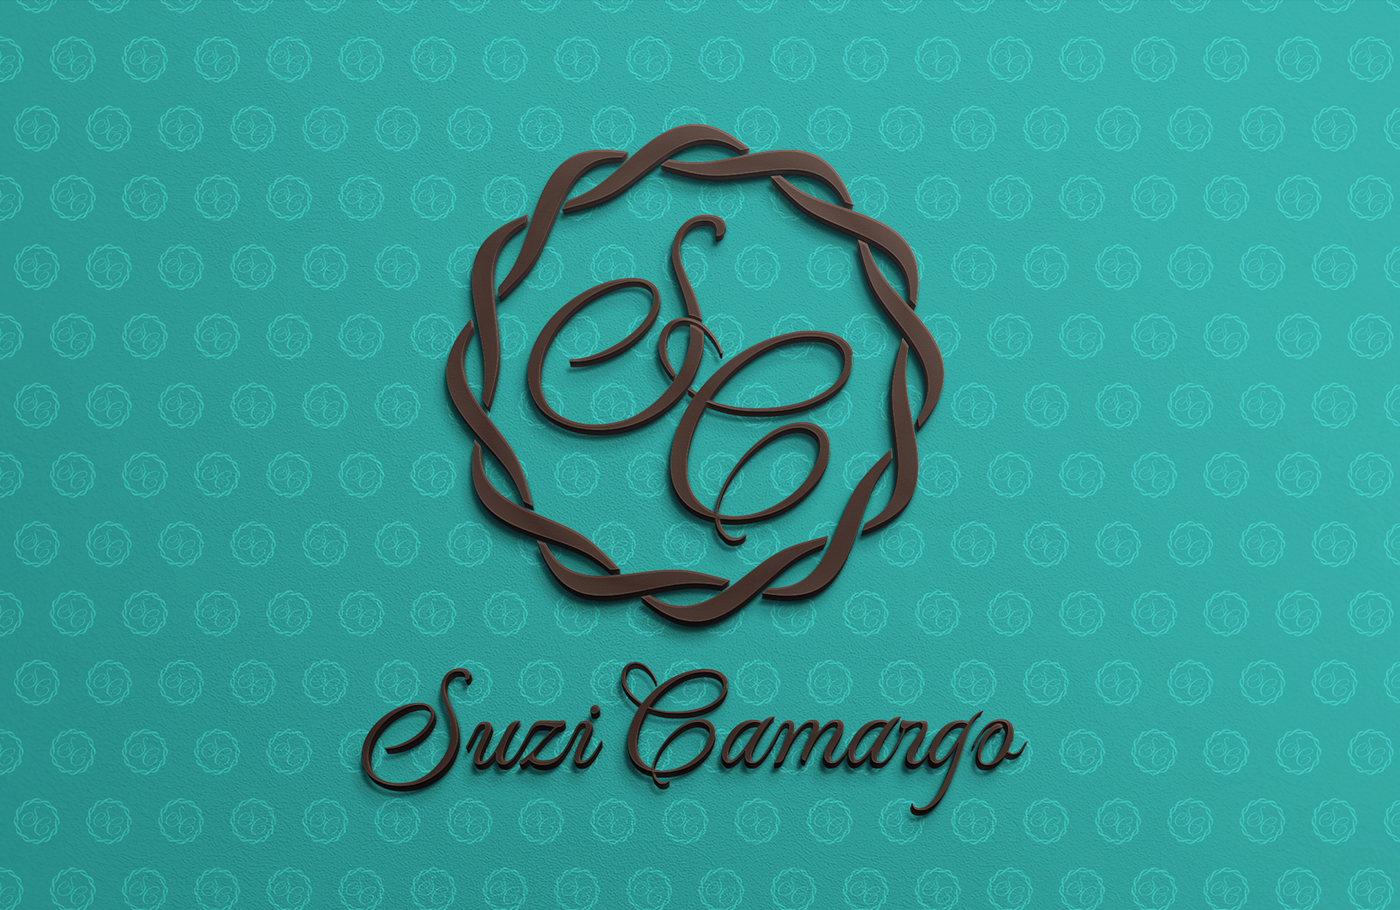 logo doces Suzi Camargo desenvolvimento projeto mark brand gestão de marca Brand Design identidade visual identidade corporativa Corporate Identity visual identity cupcakes